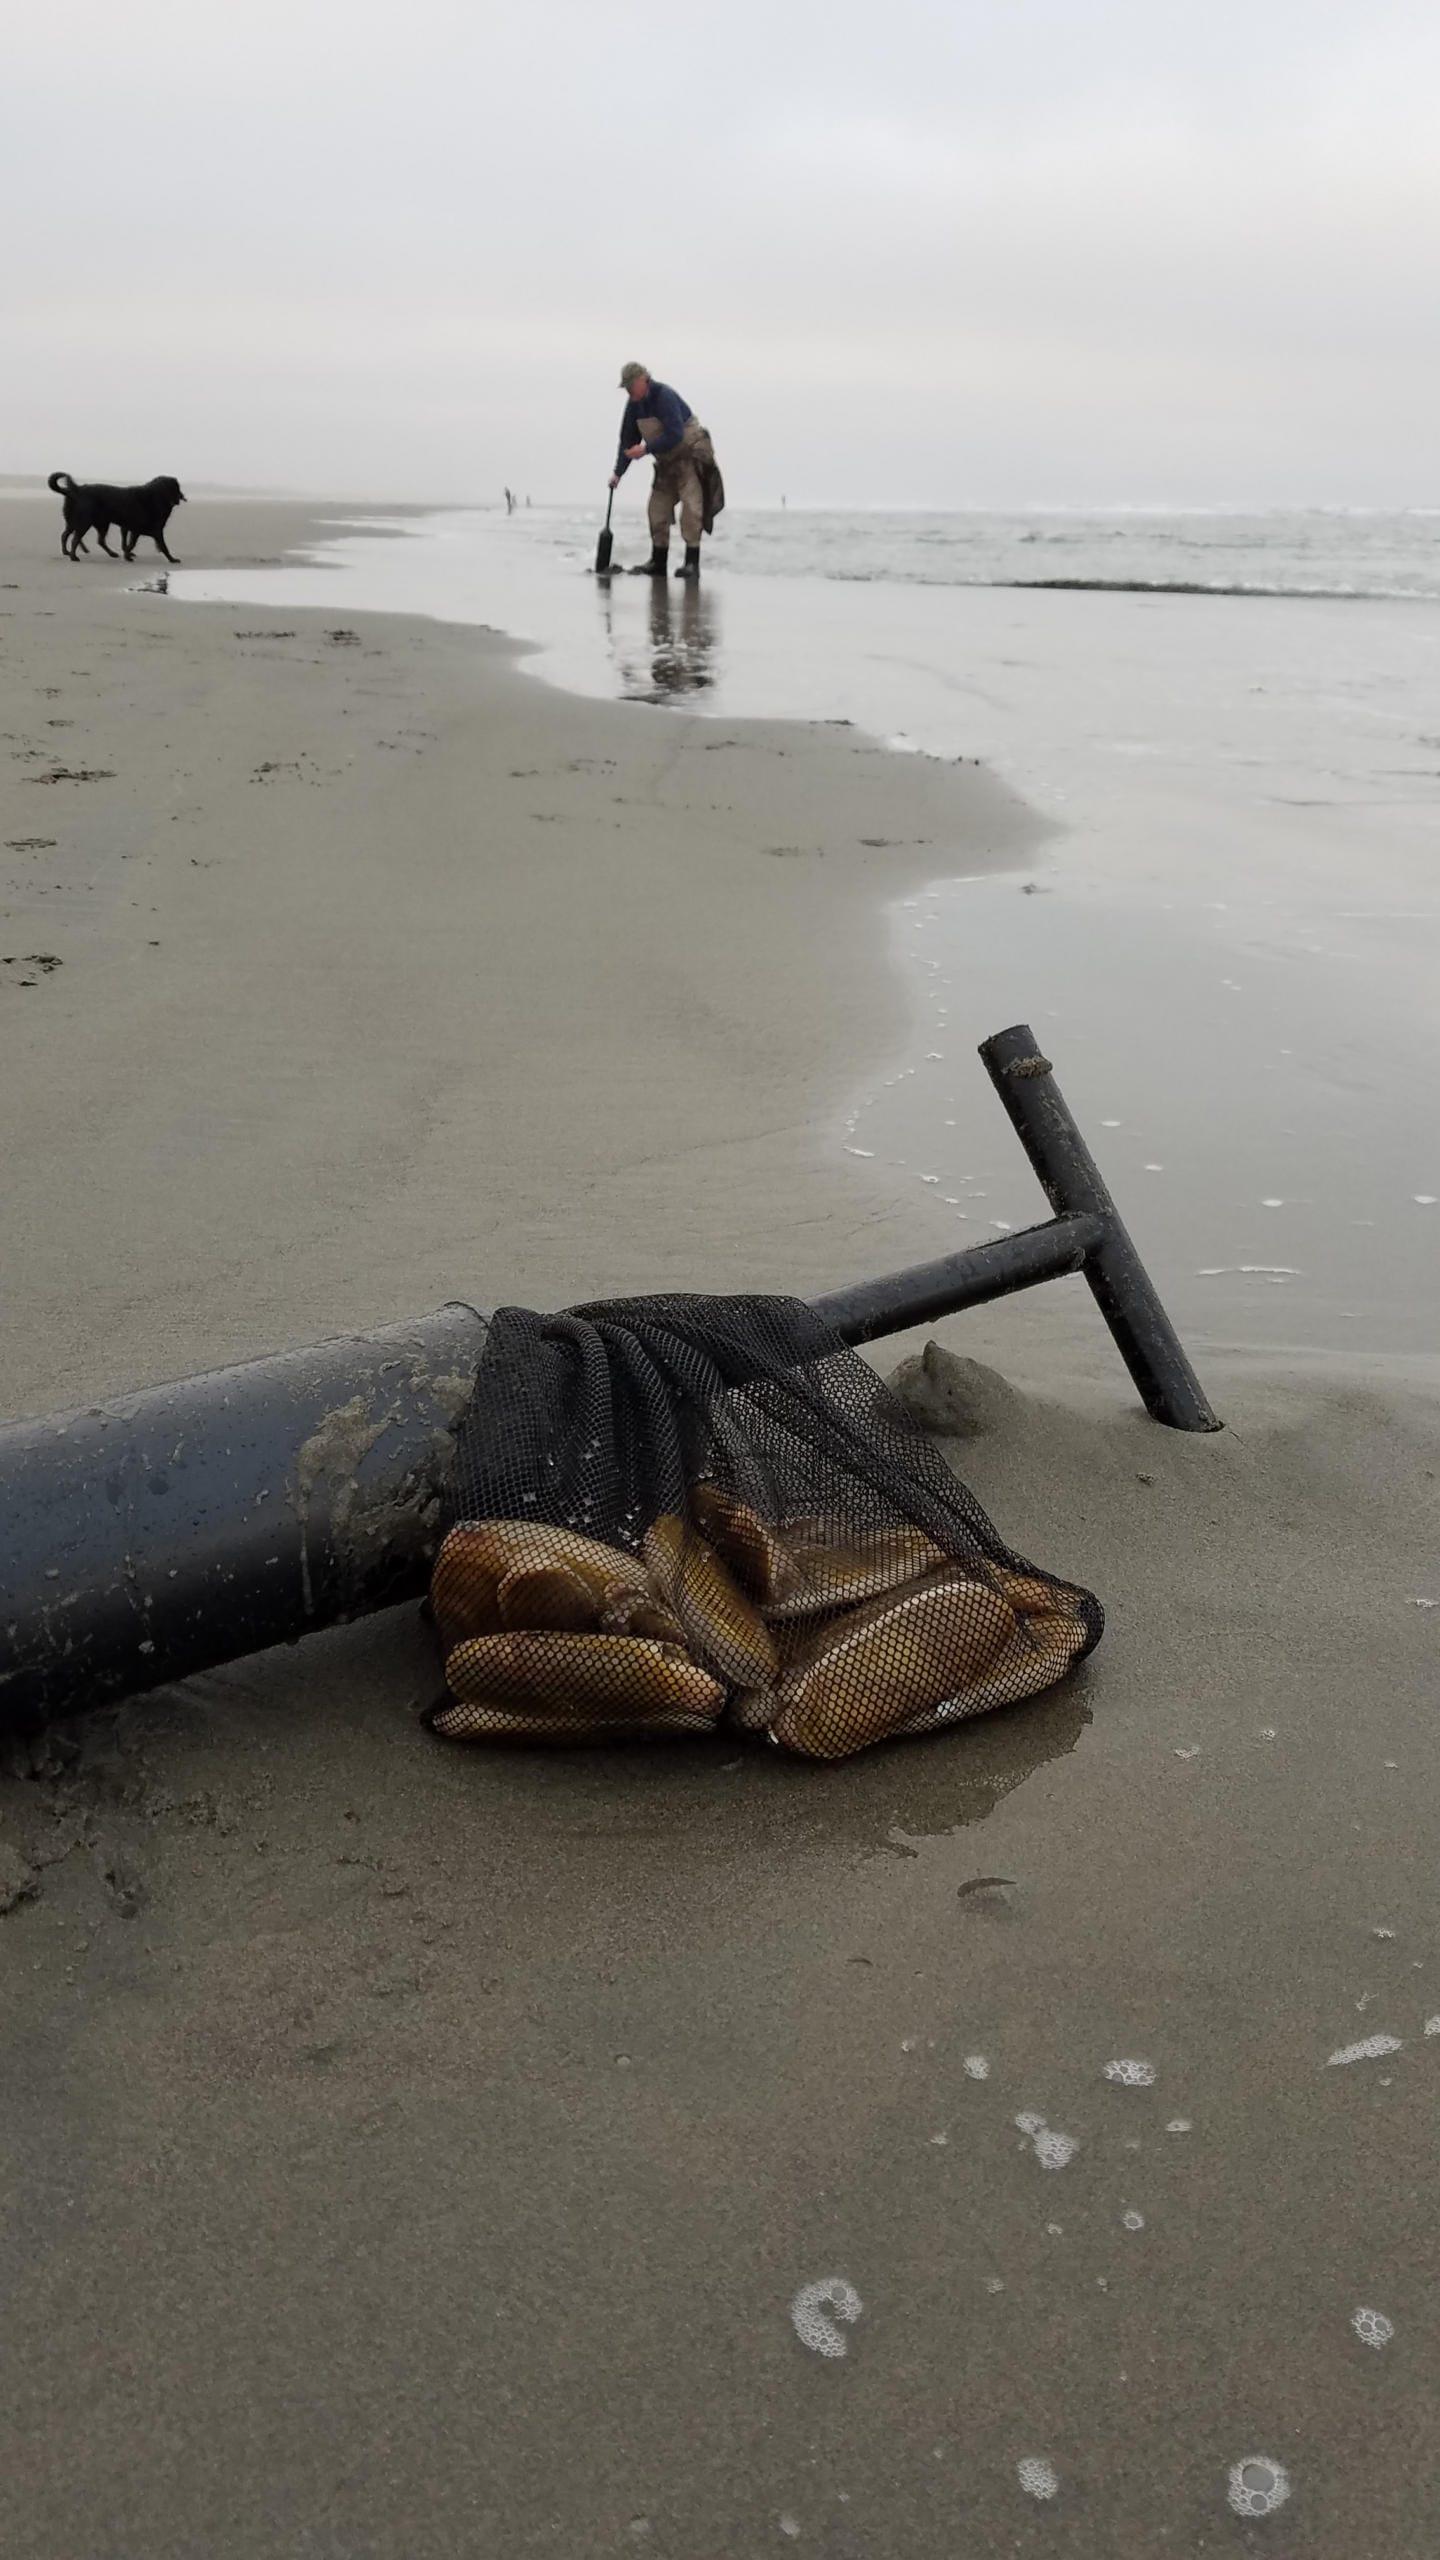 Razor clam digging at Mocrocks Beach OK'd for Saturday, Monday